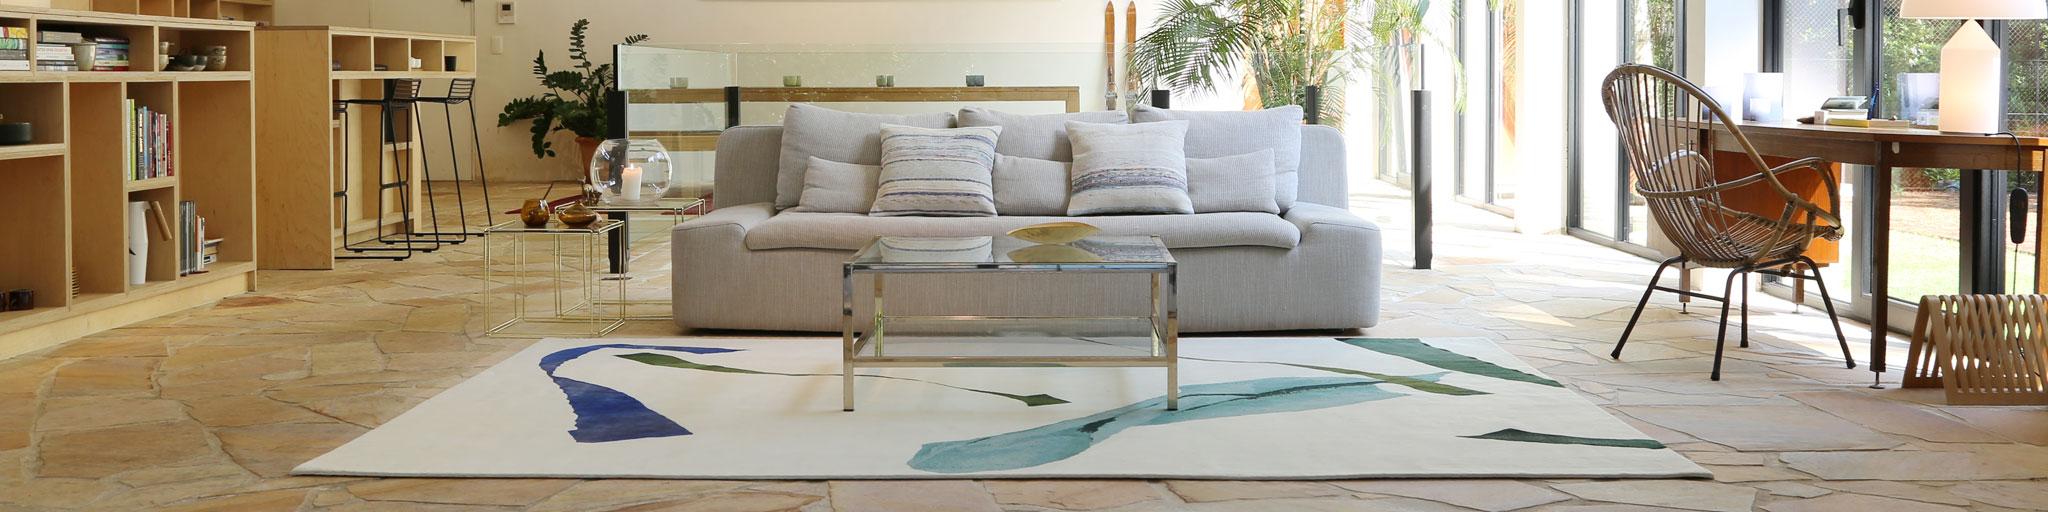 'carpet blue/green' | Ashtari